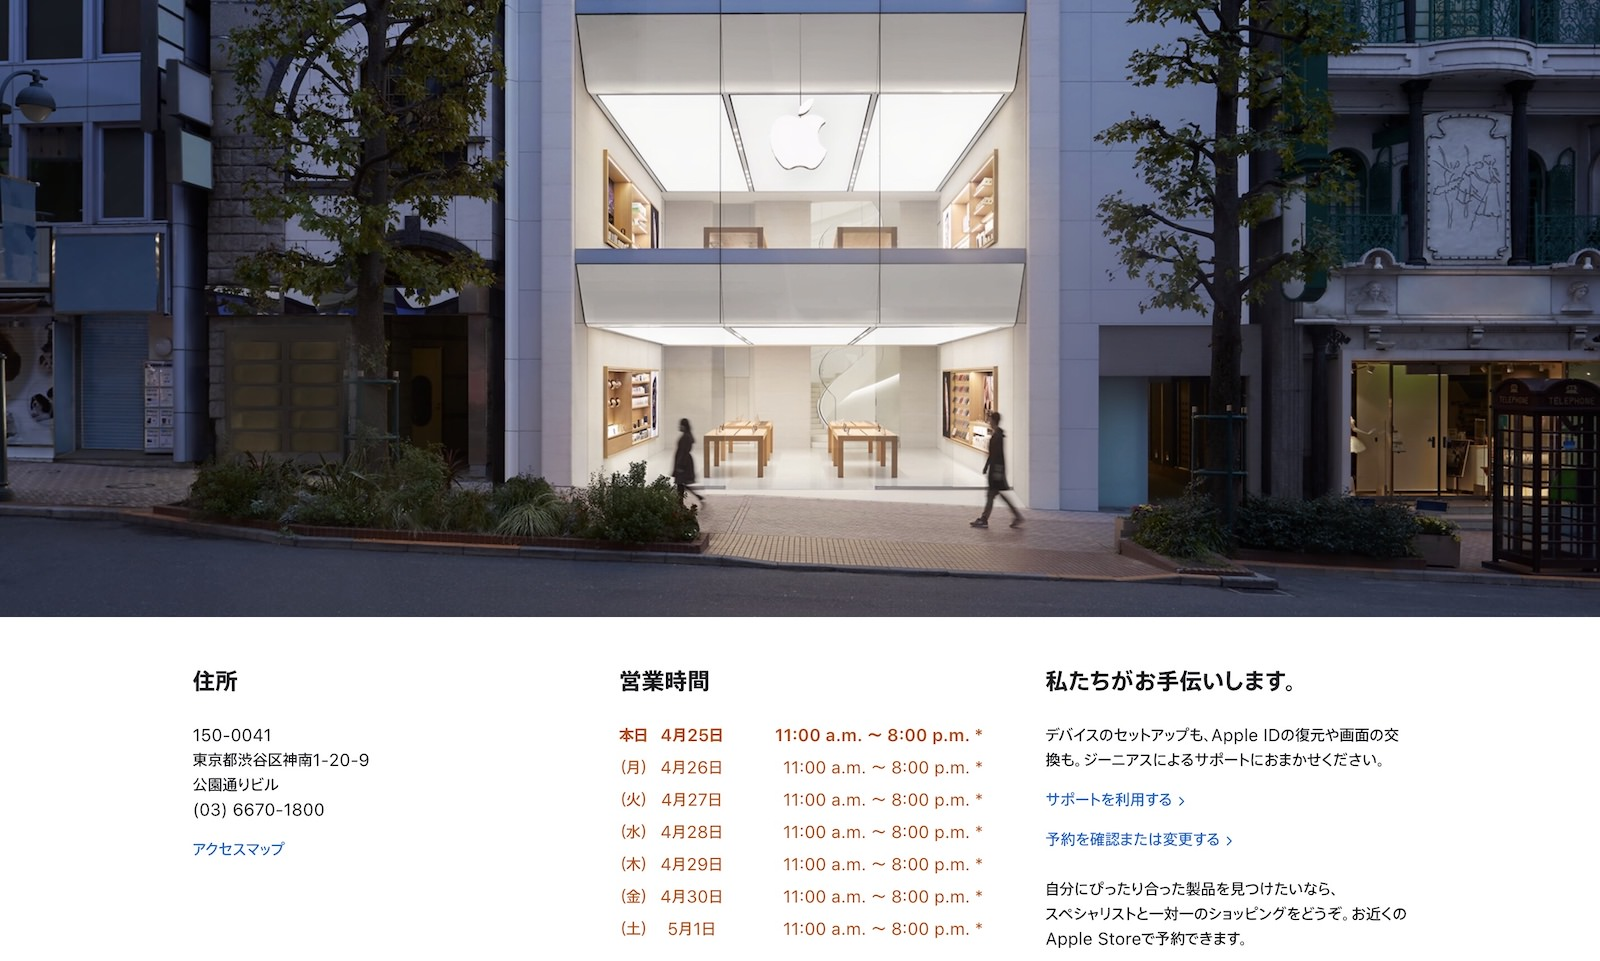 Apple Shibuya hours